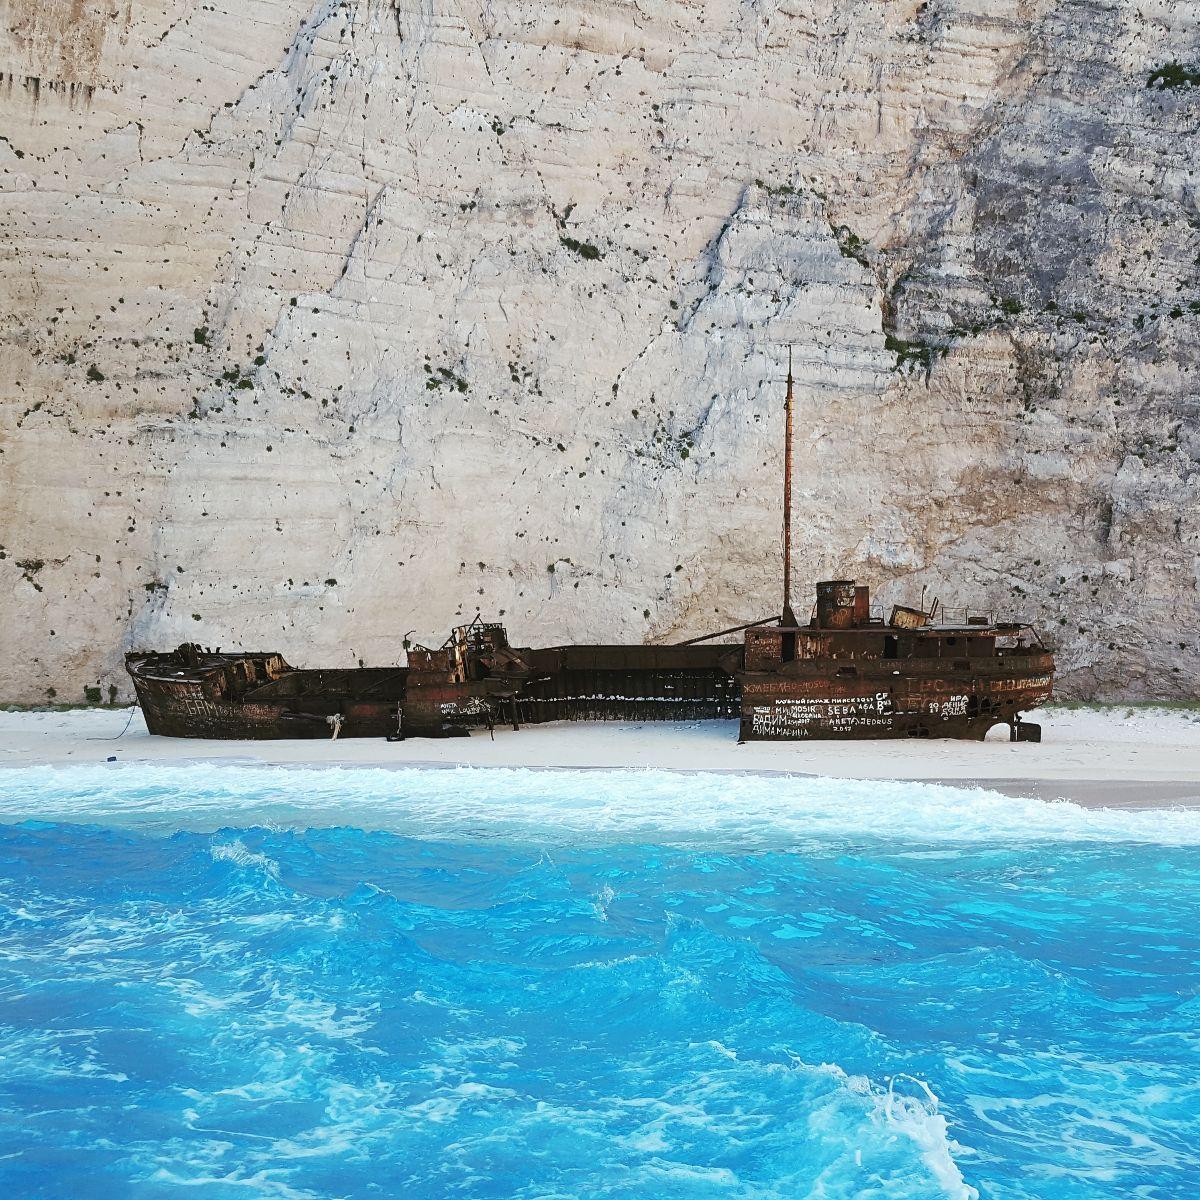 Shipwreck beach vanaf de boot gezien